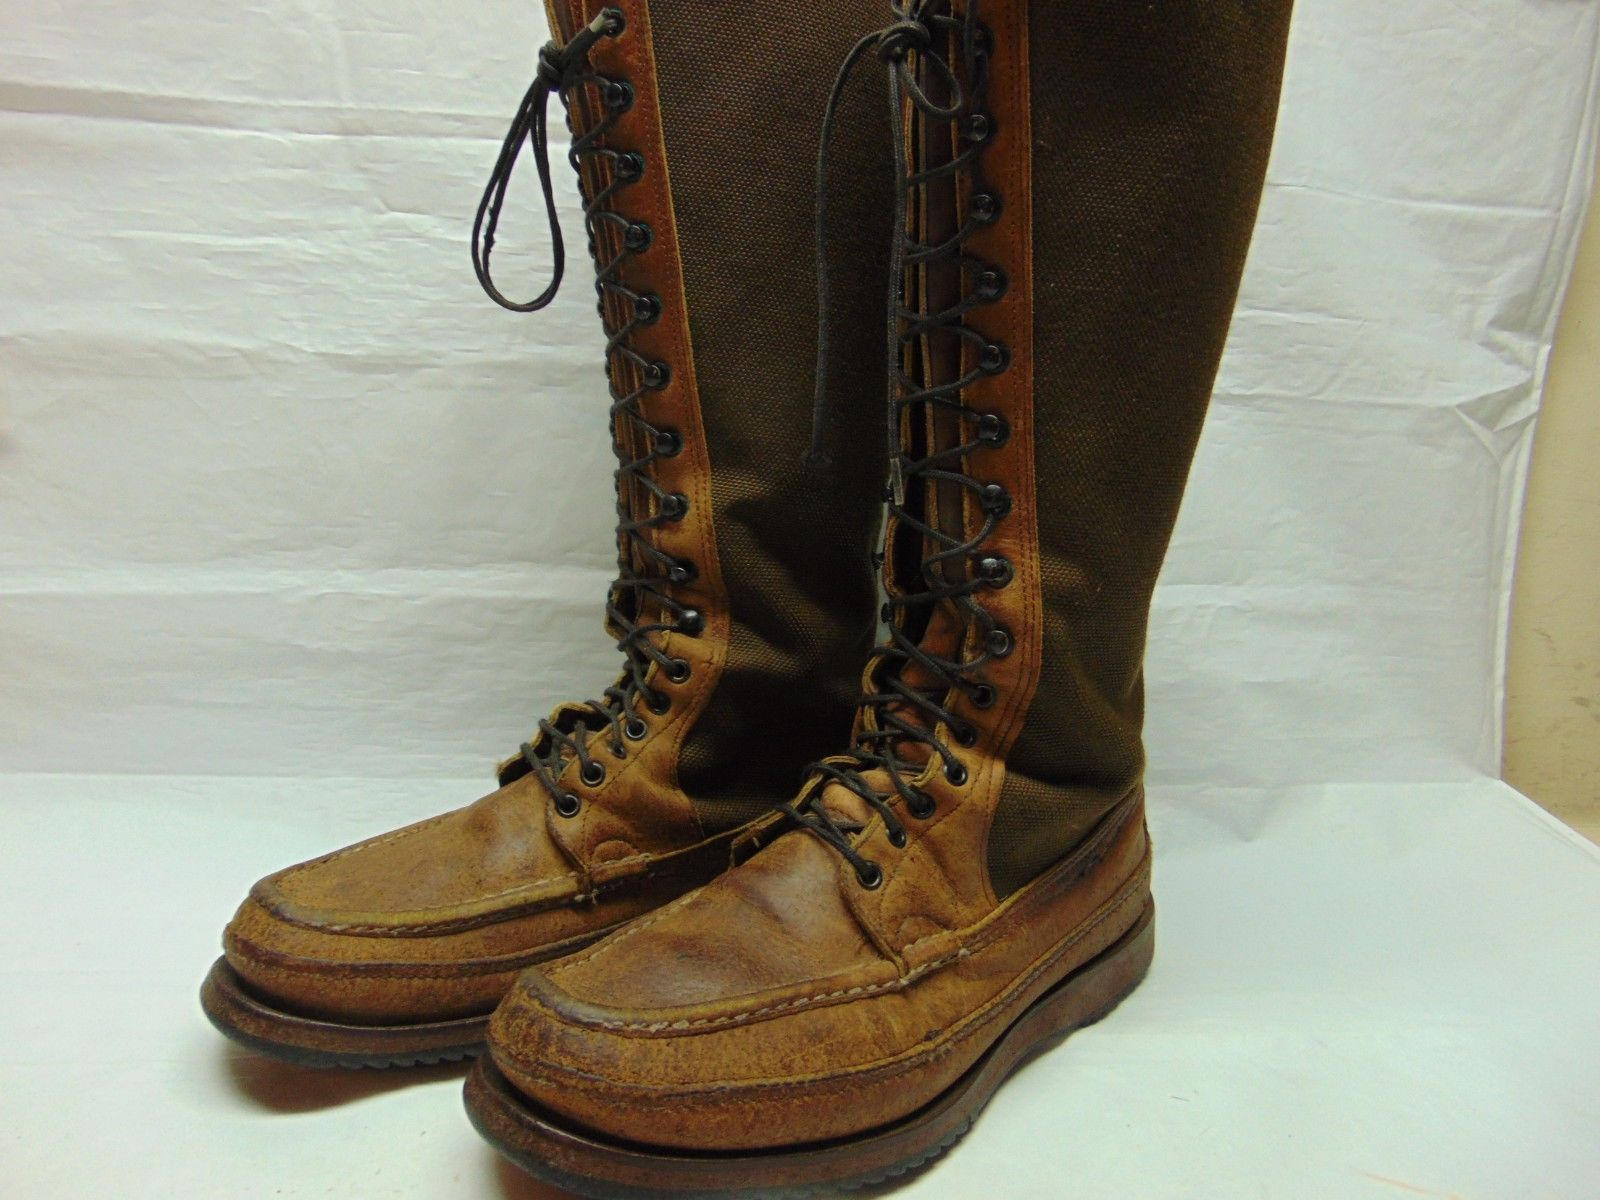 19444e1f1b2 Russell Moccasin Turkey Hunter w/ Turtleskin Lace Up Knee High Moc ...